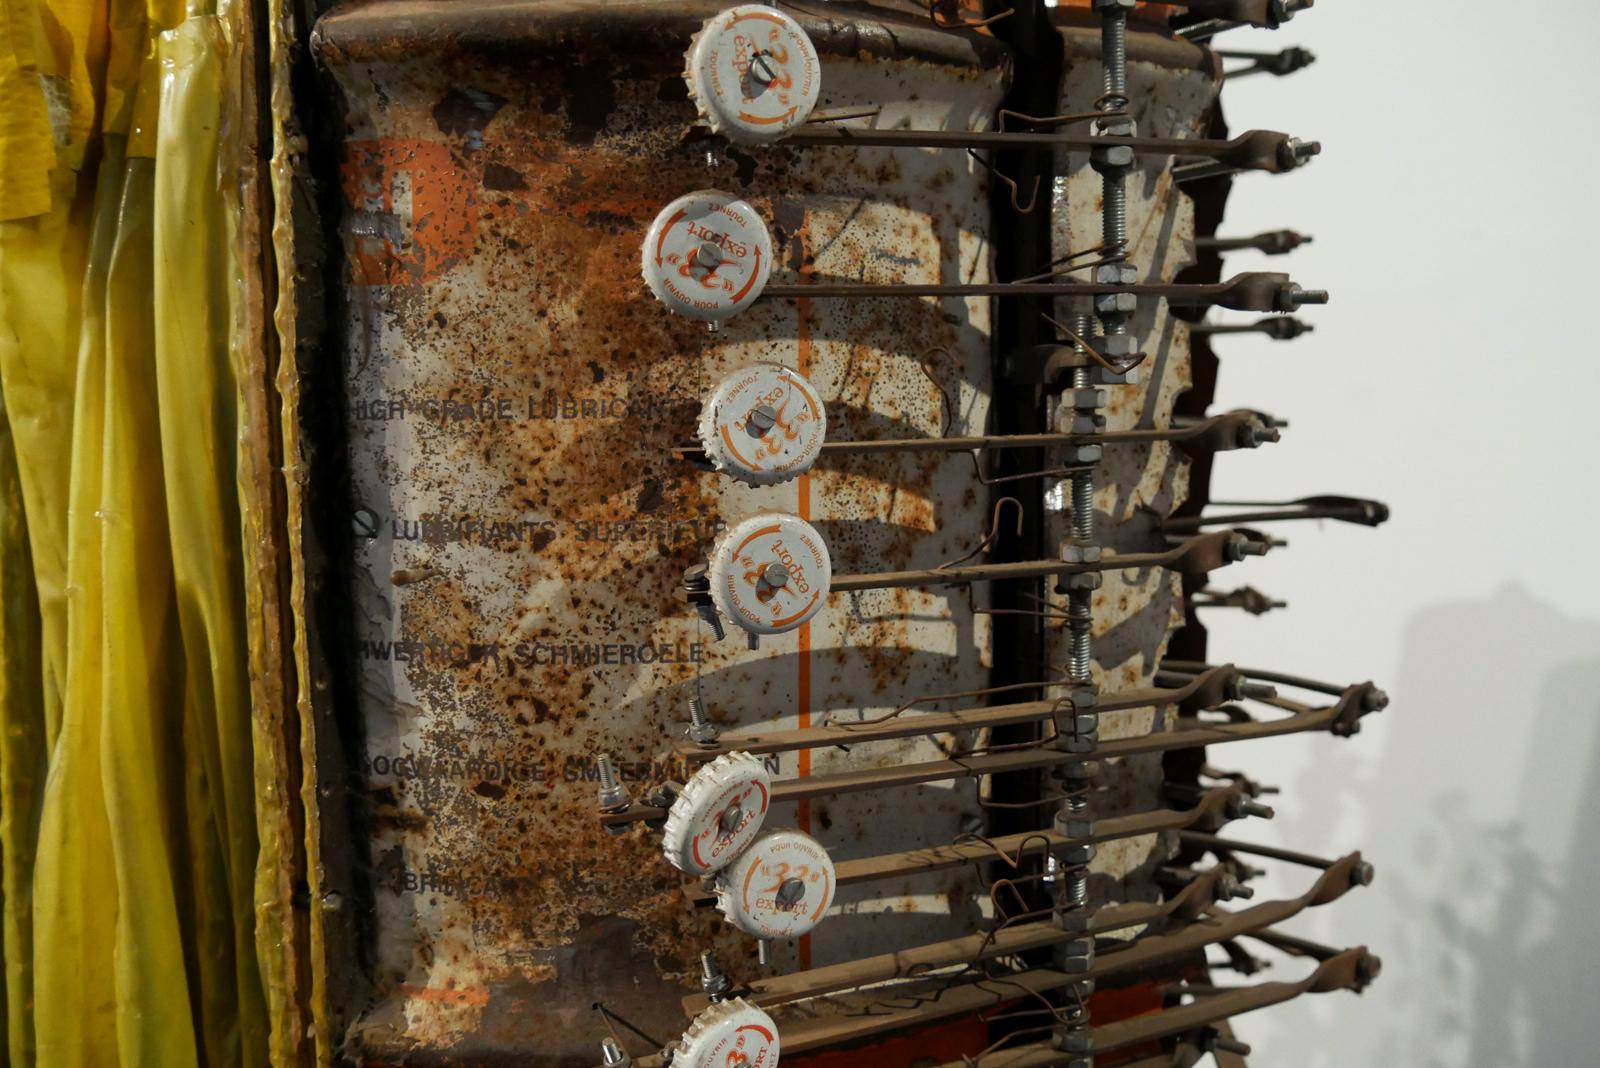 gilbert-peyre-accordeon-1992-1998-elecropneumatique-exposition-halle-saint-pierre-paris